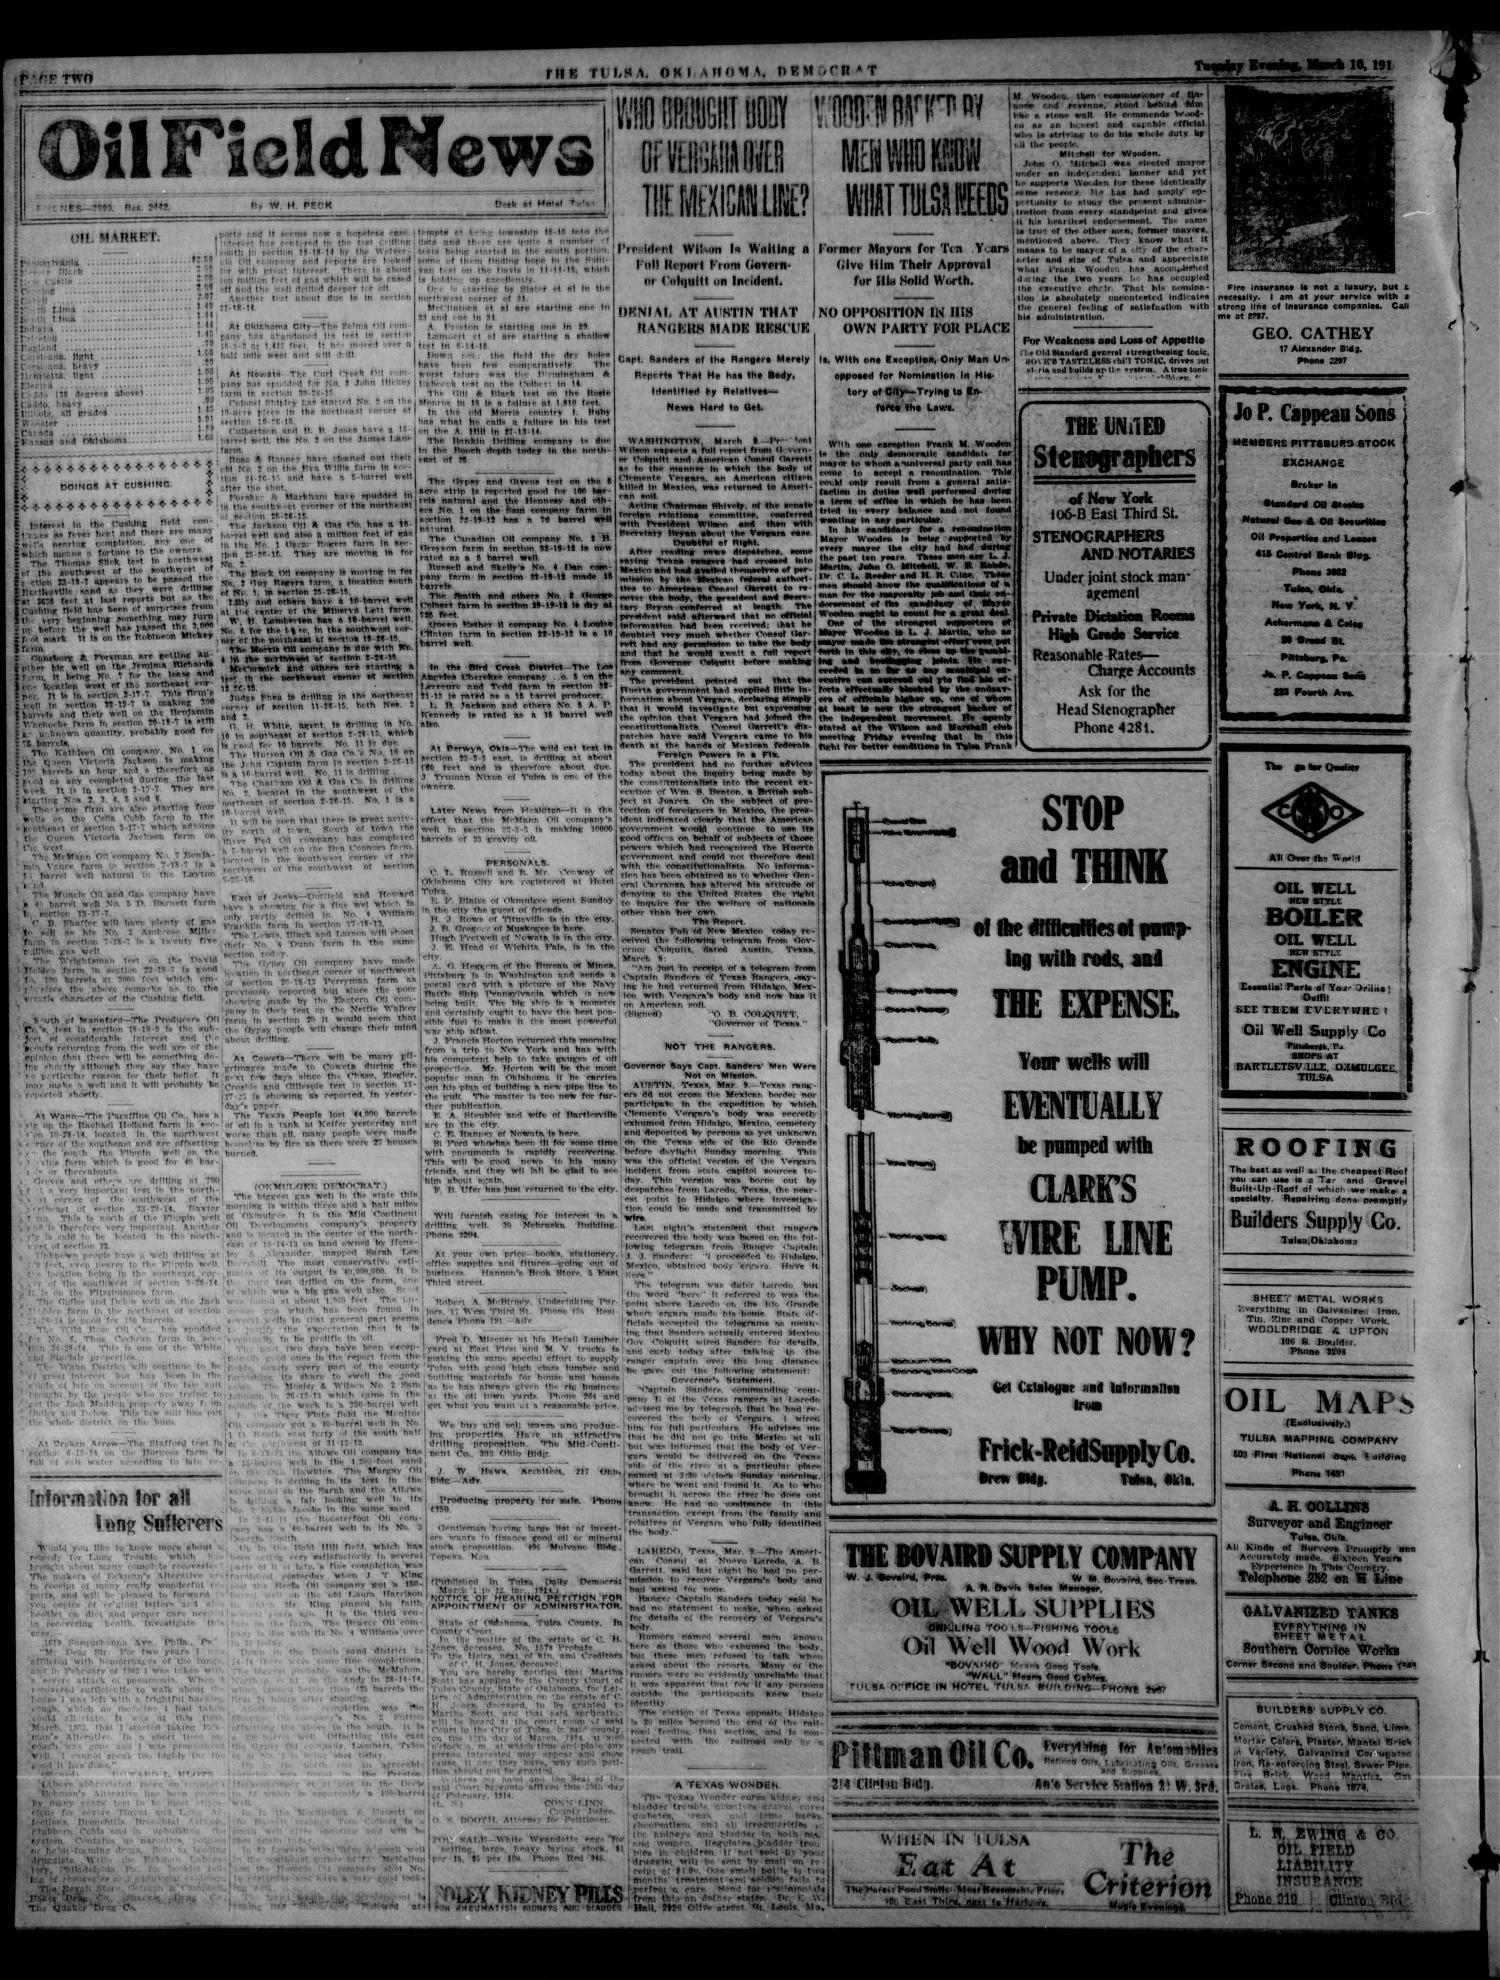 The Tulsa Democrat (Tulsa, Okla ), Vol  10, No  154, Ed  1 Tuesday